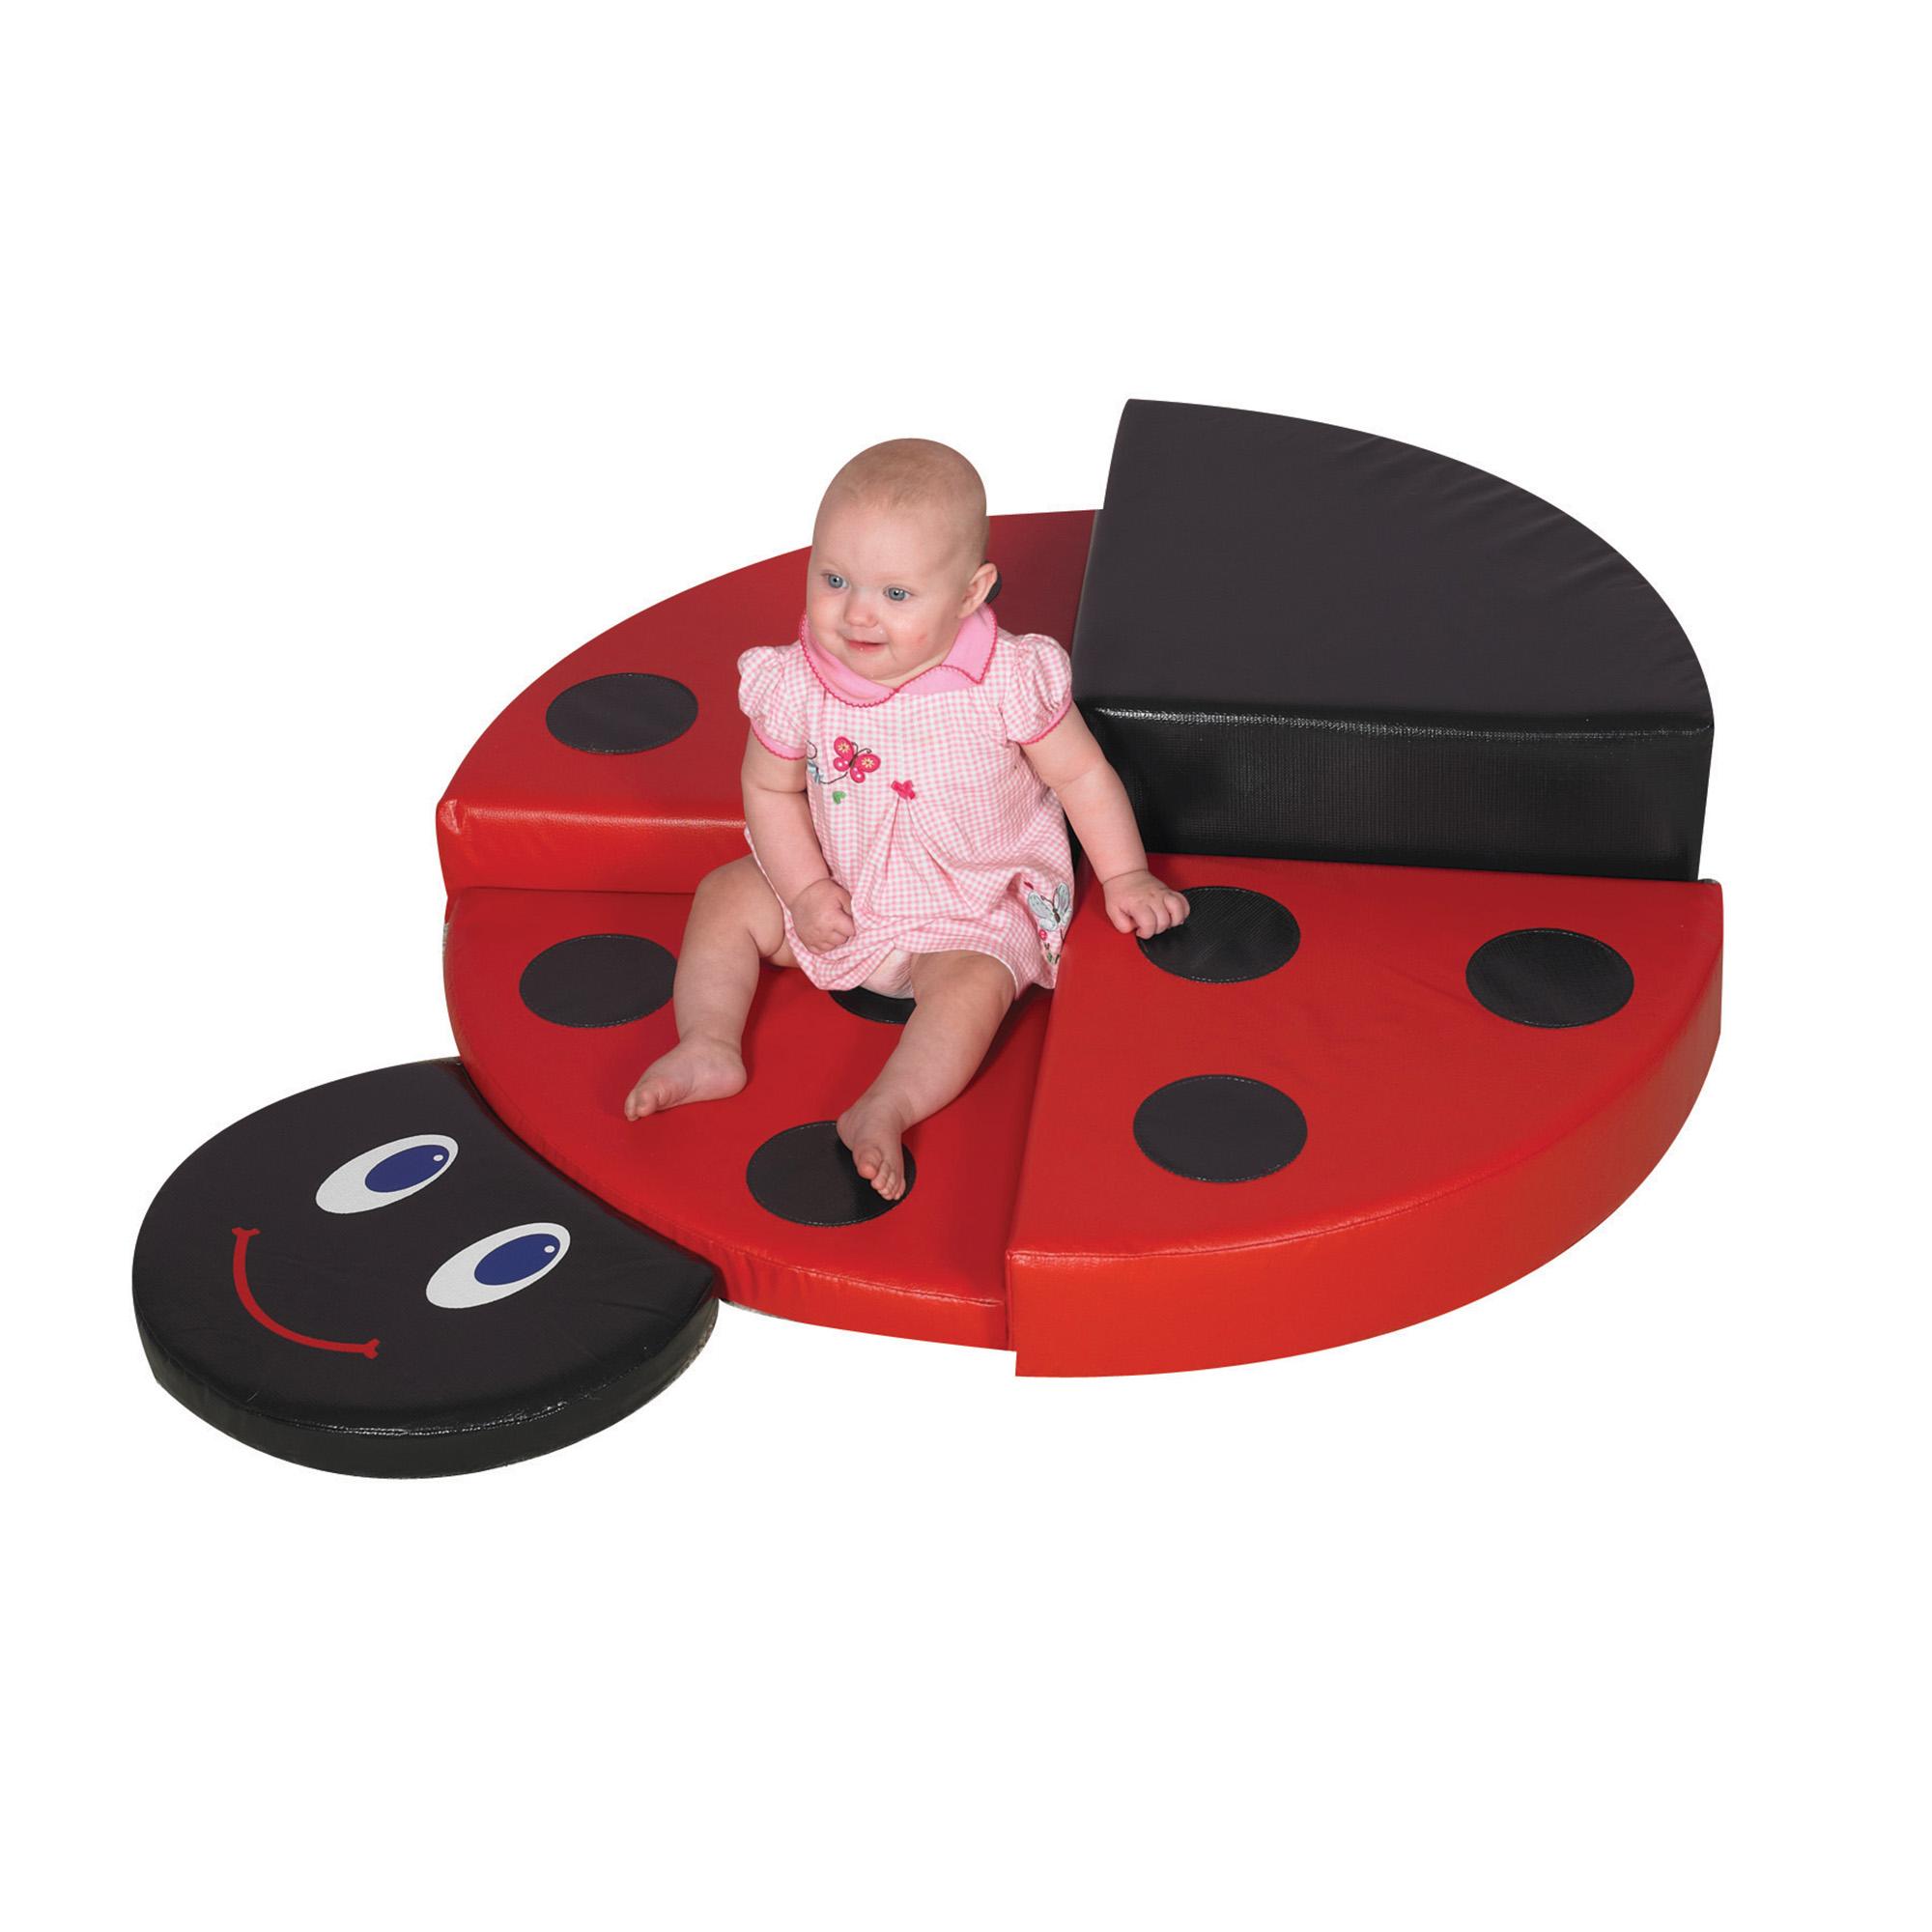 Childrens Factory Ladybug Climber Classroom Furniture CF322-374